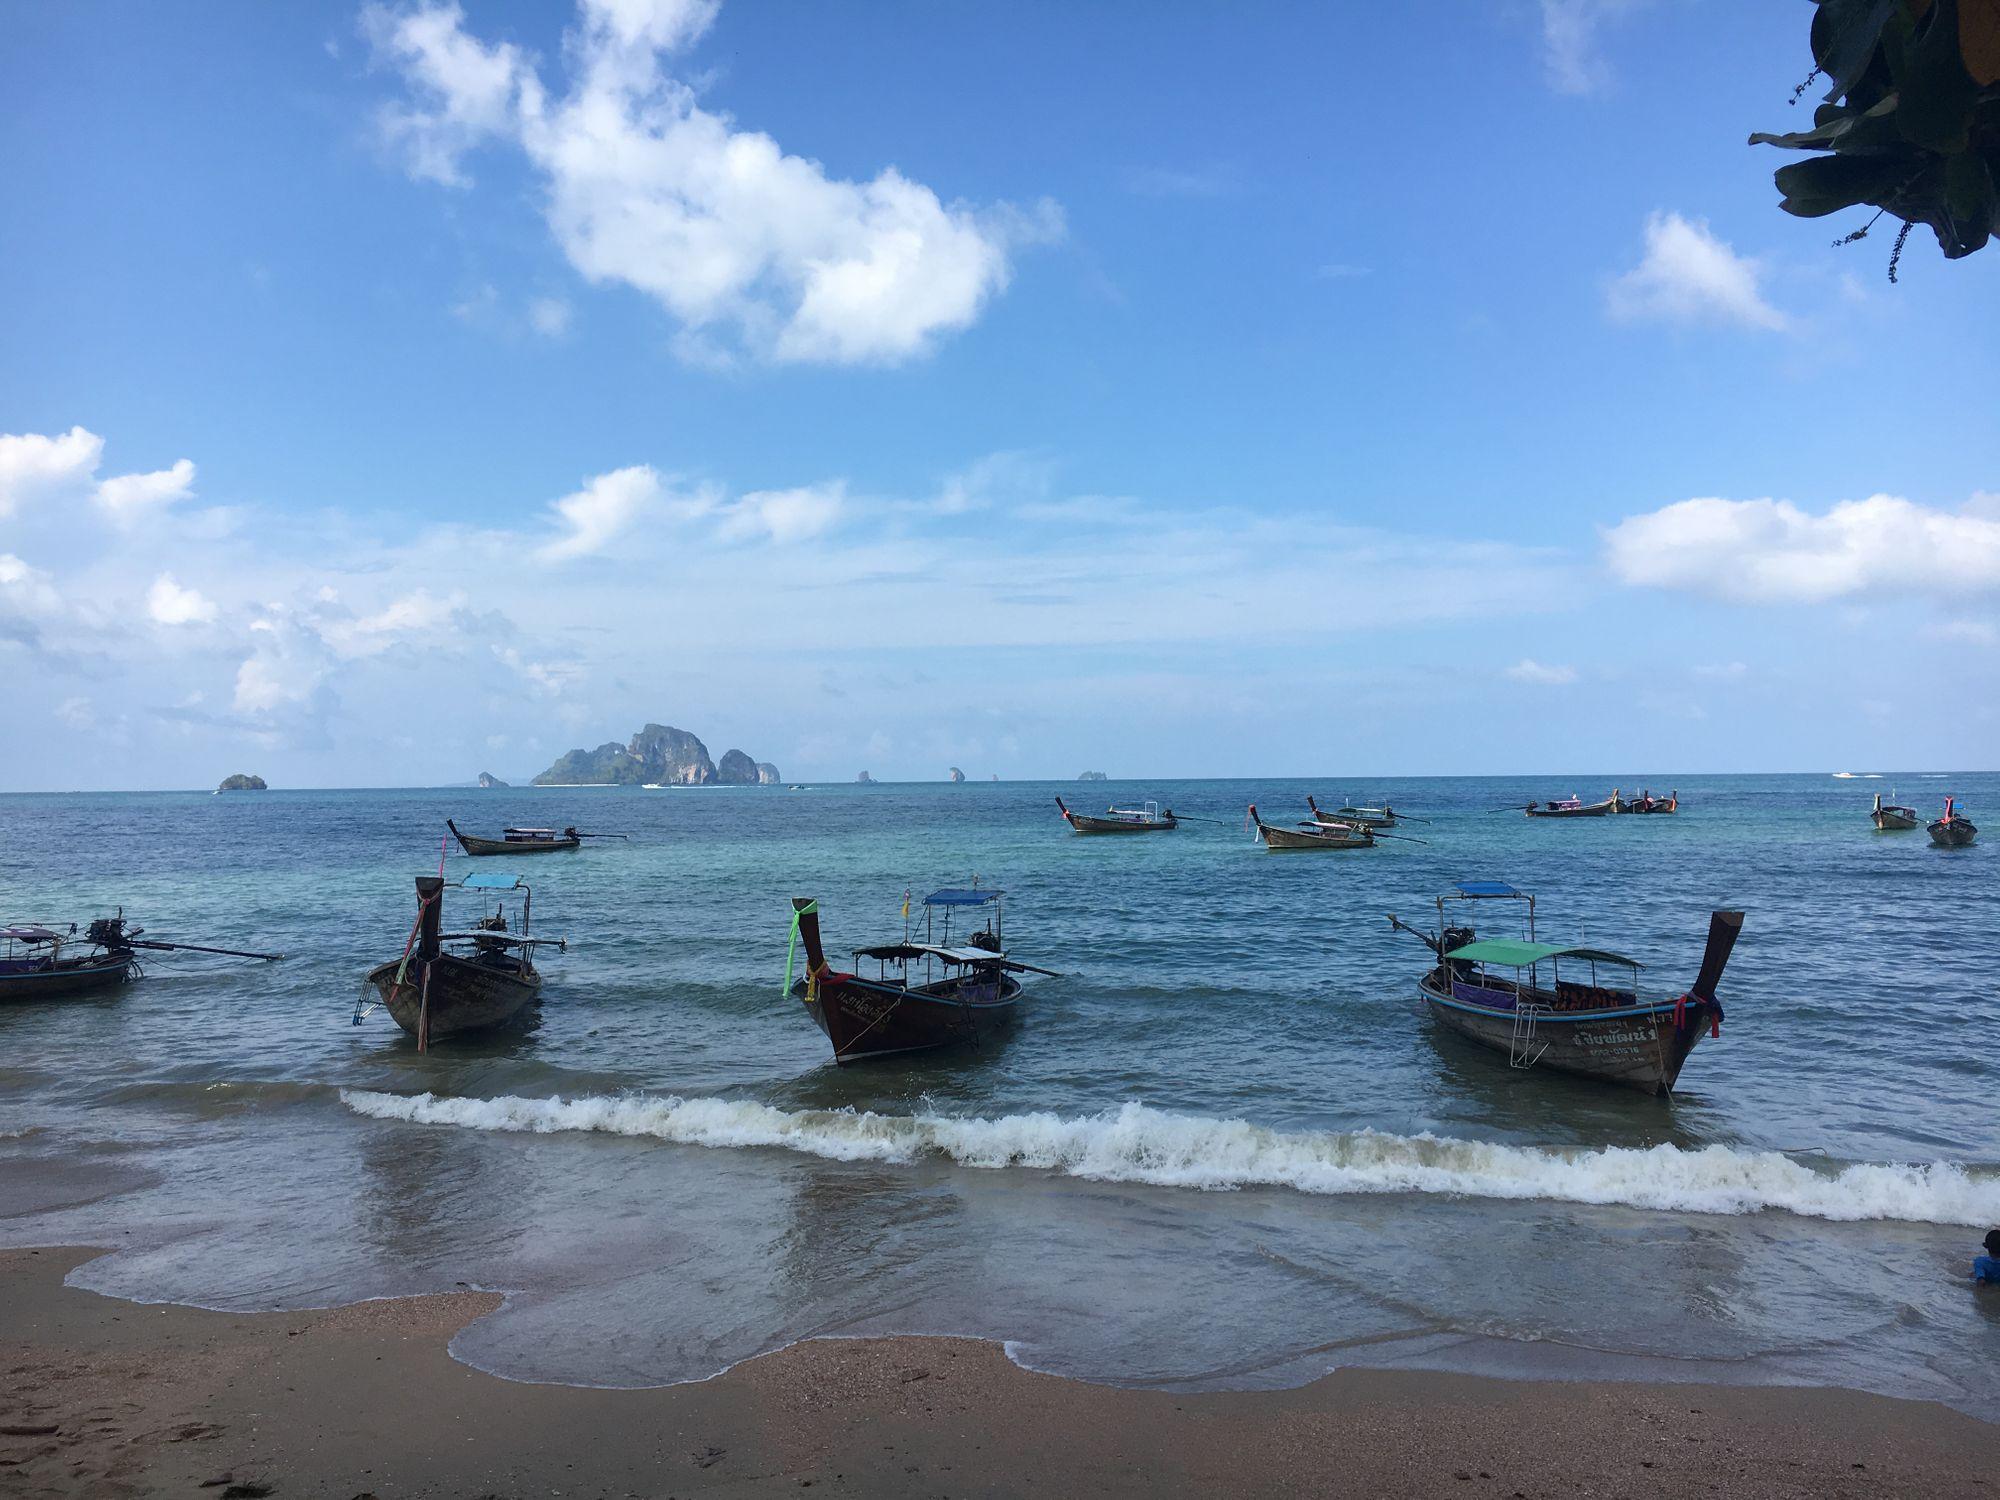 AirCampus en voyage : Krabi en 3 jours